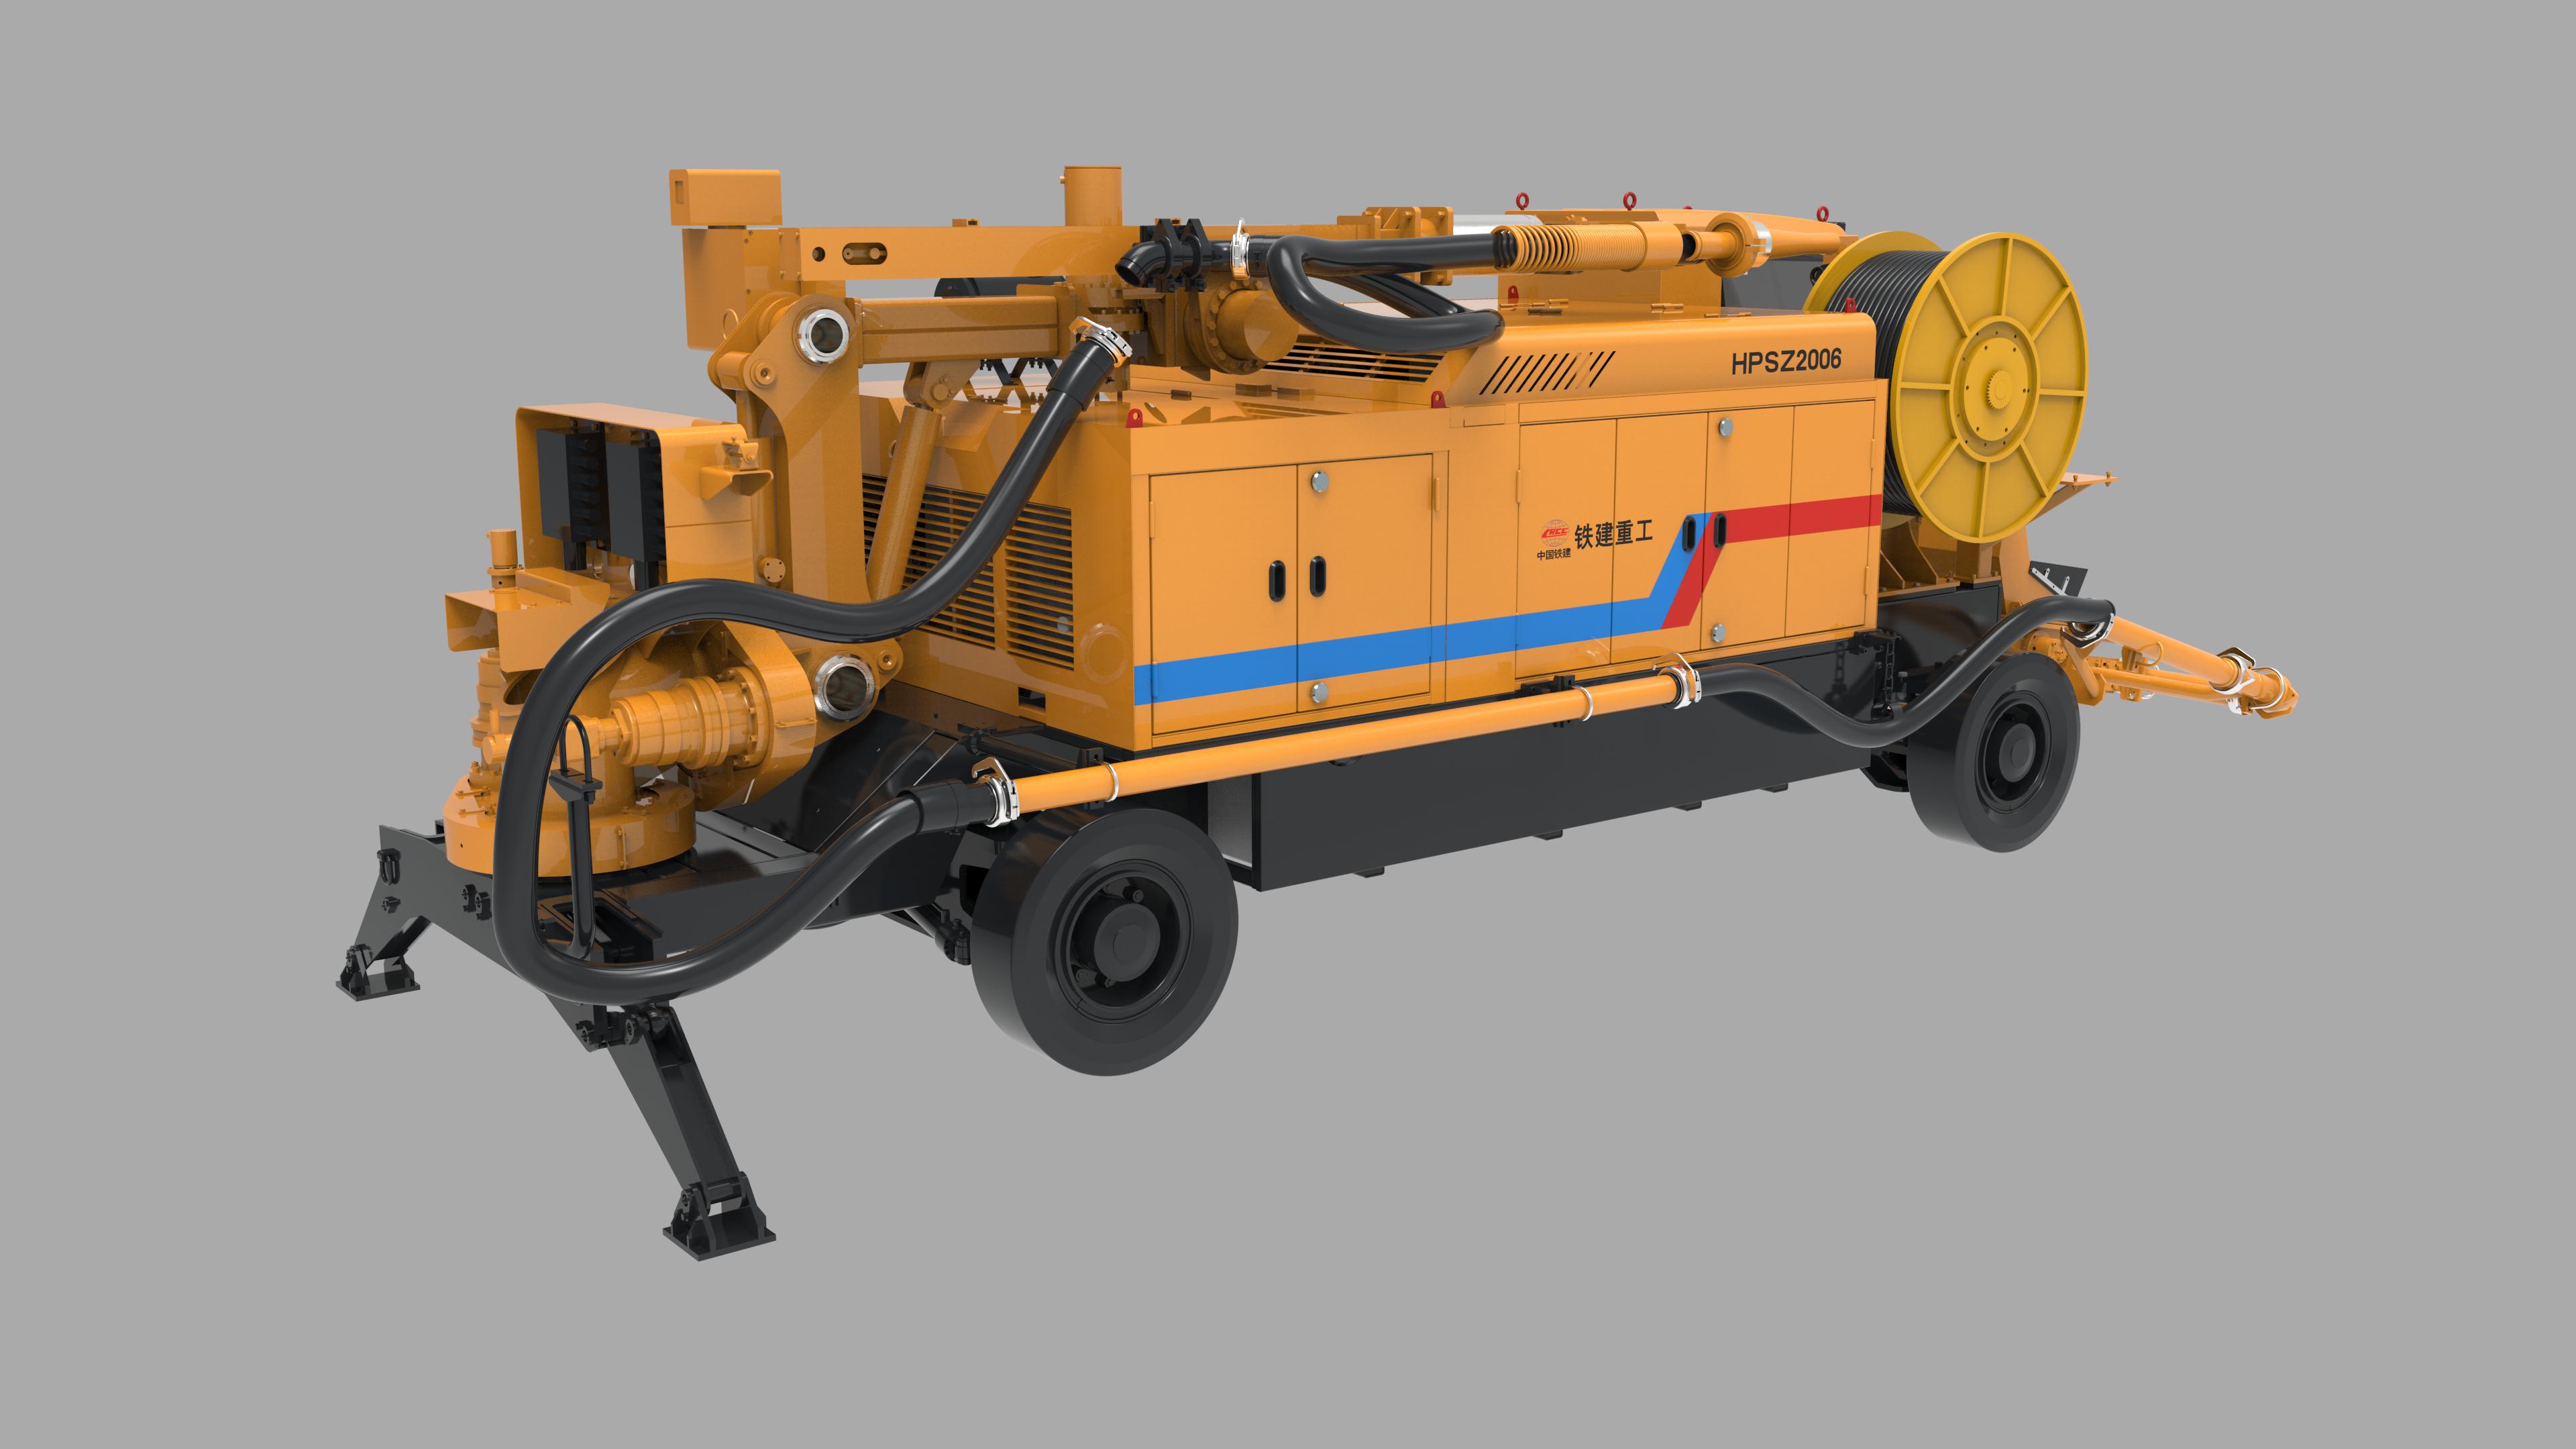 Concrete spraying equipment for mining applicaiton